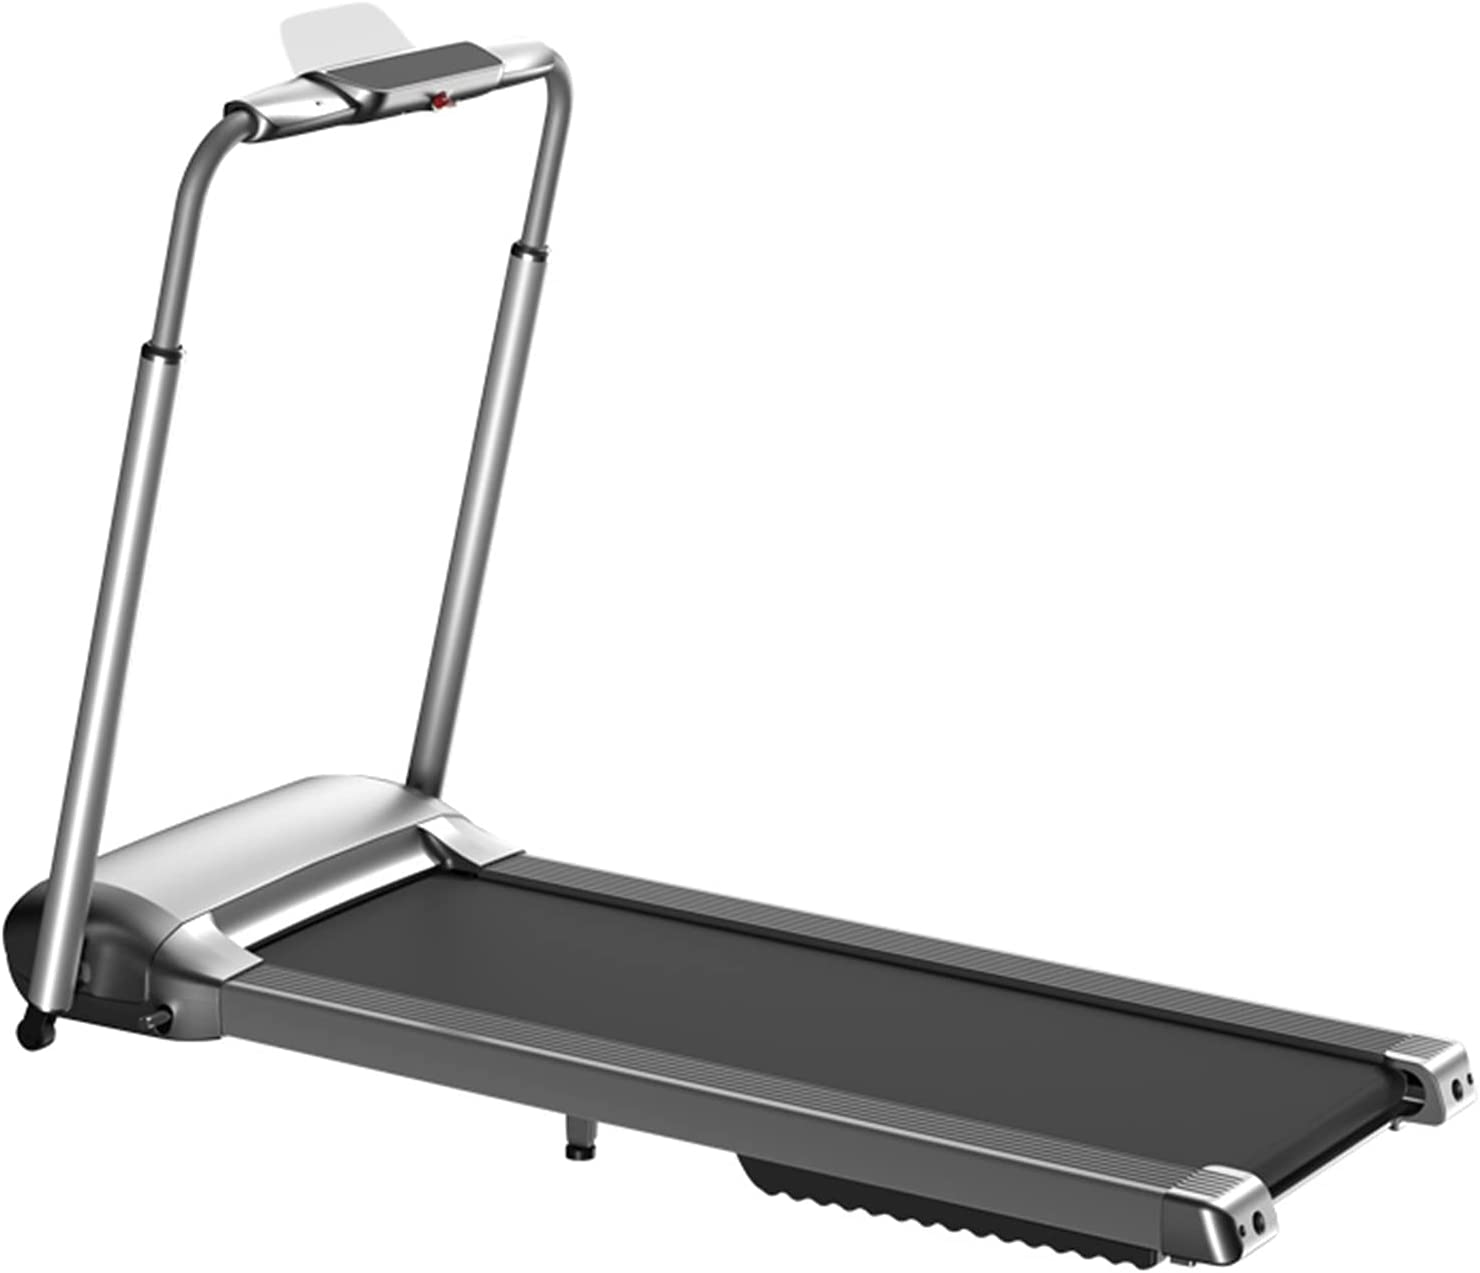 Treadmill Electric 5 ☆ popular Folding Colorado Springs Mall Home Run Portable Walk Gym